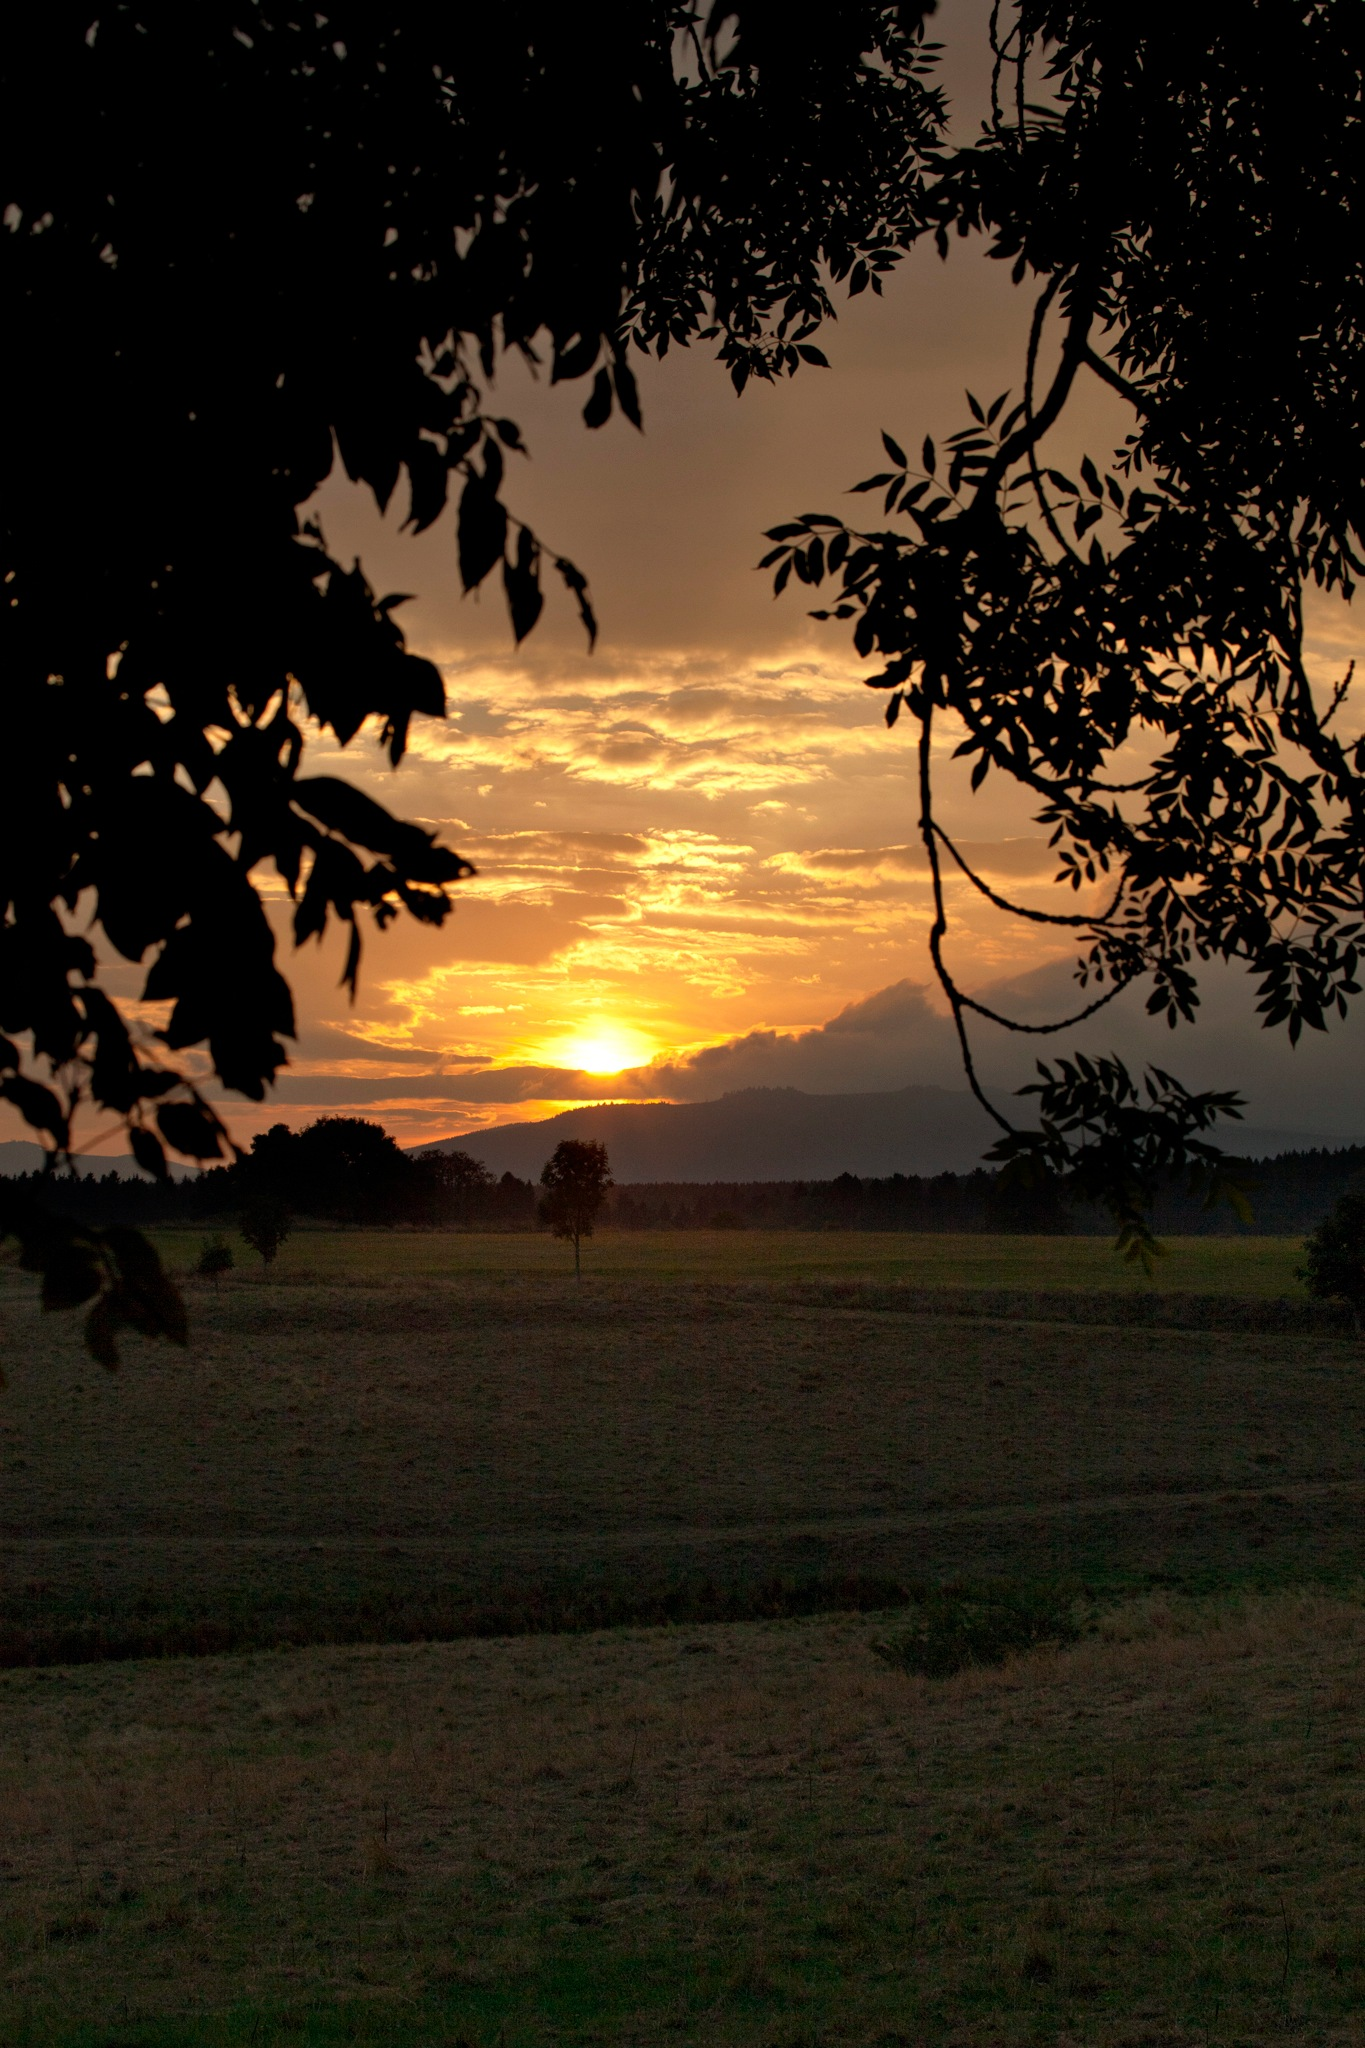 ... the last sunrays – beautiful by Ines Linke